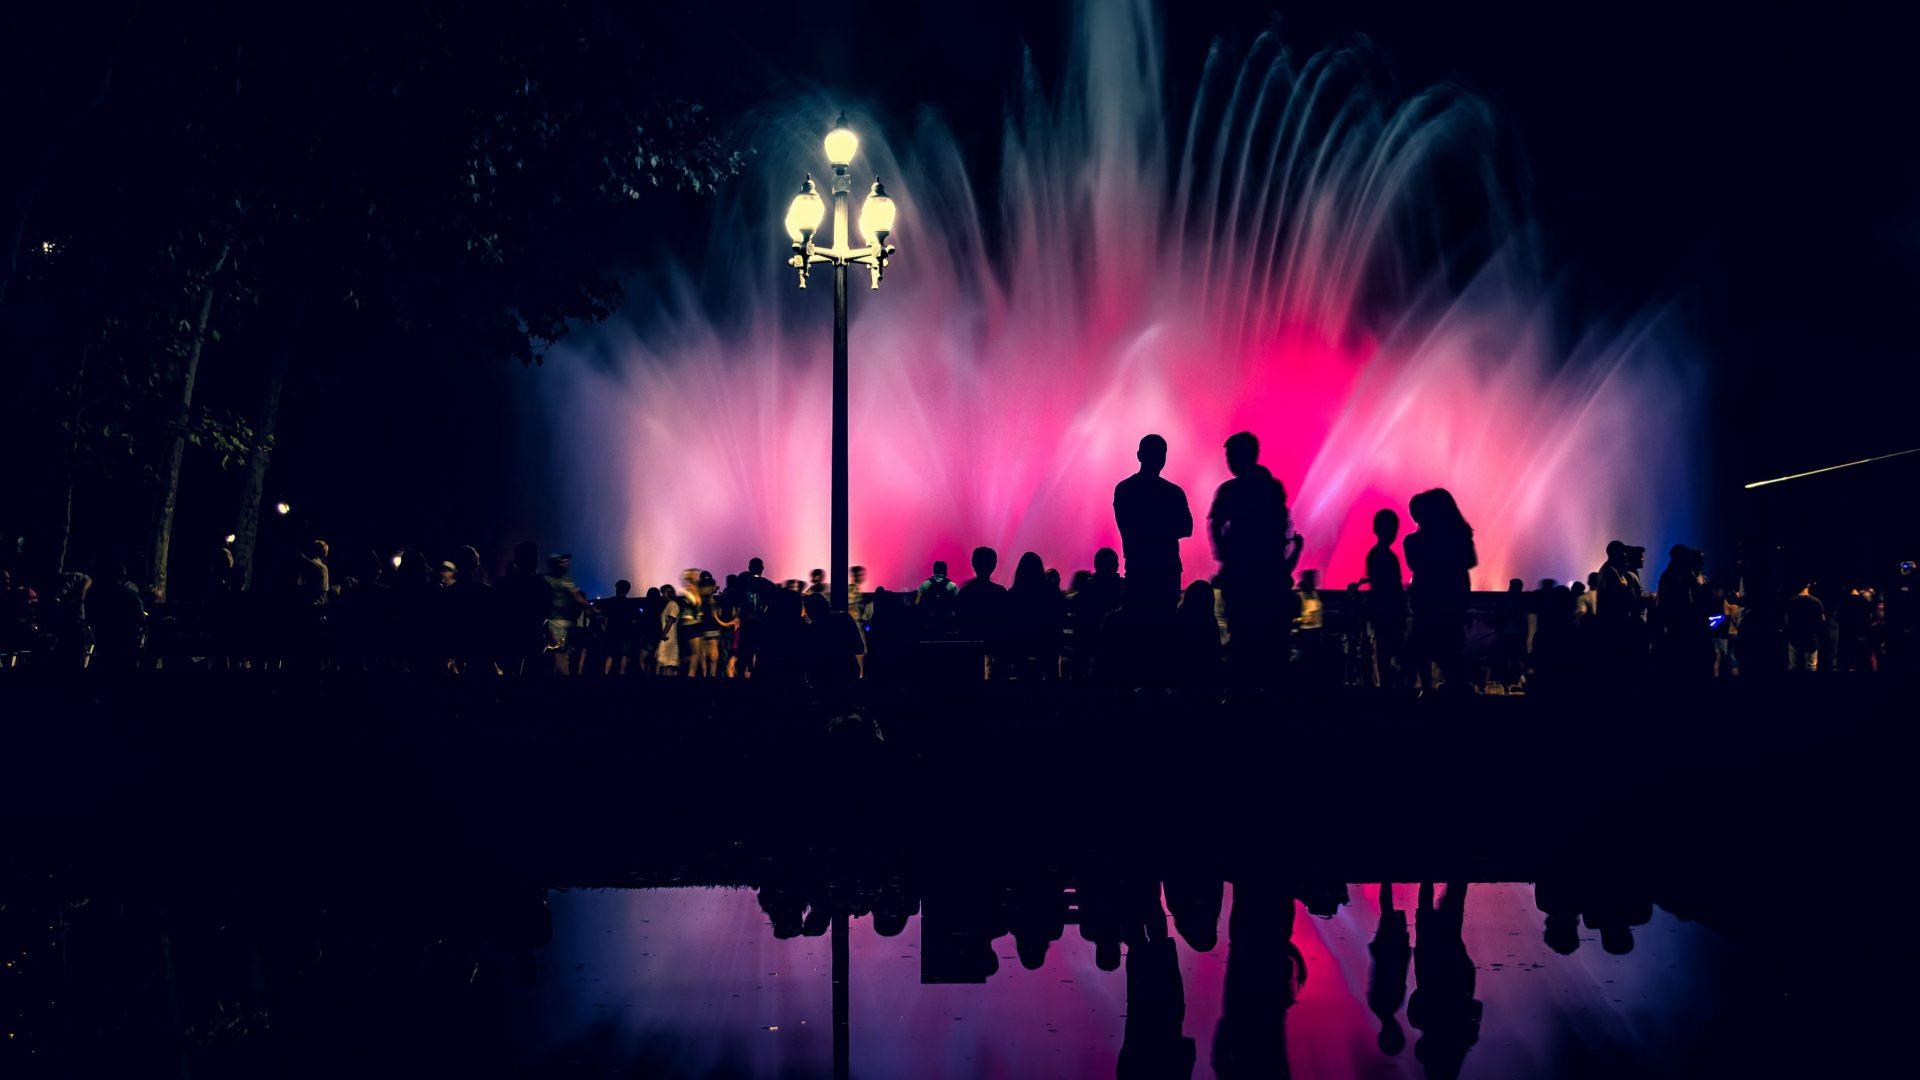 Magic Fountain show, Montjuic, Barcelona